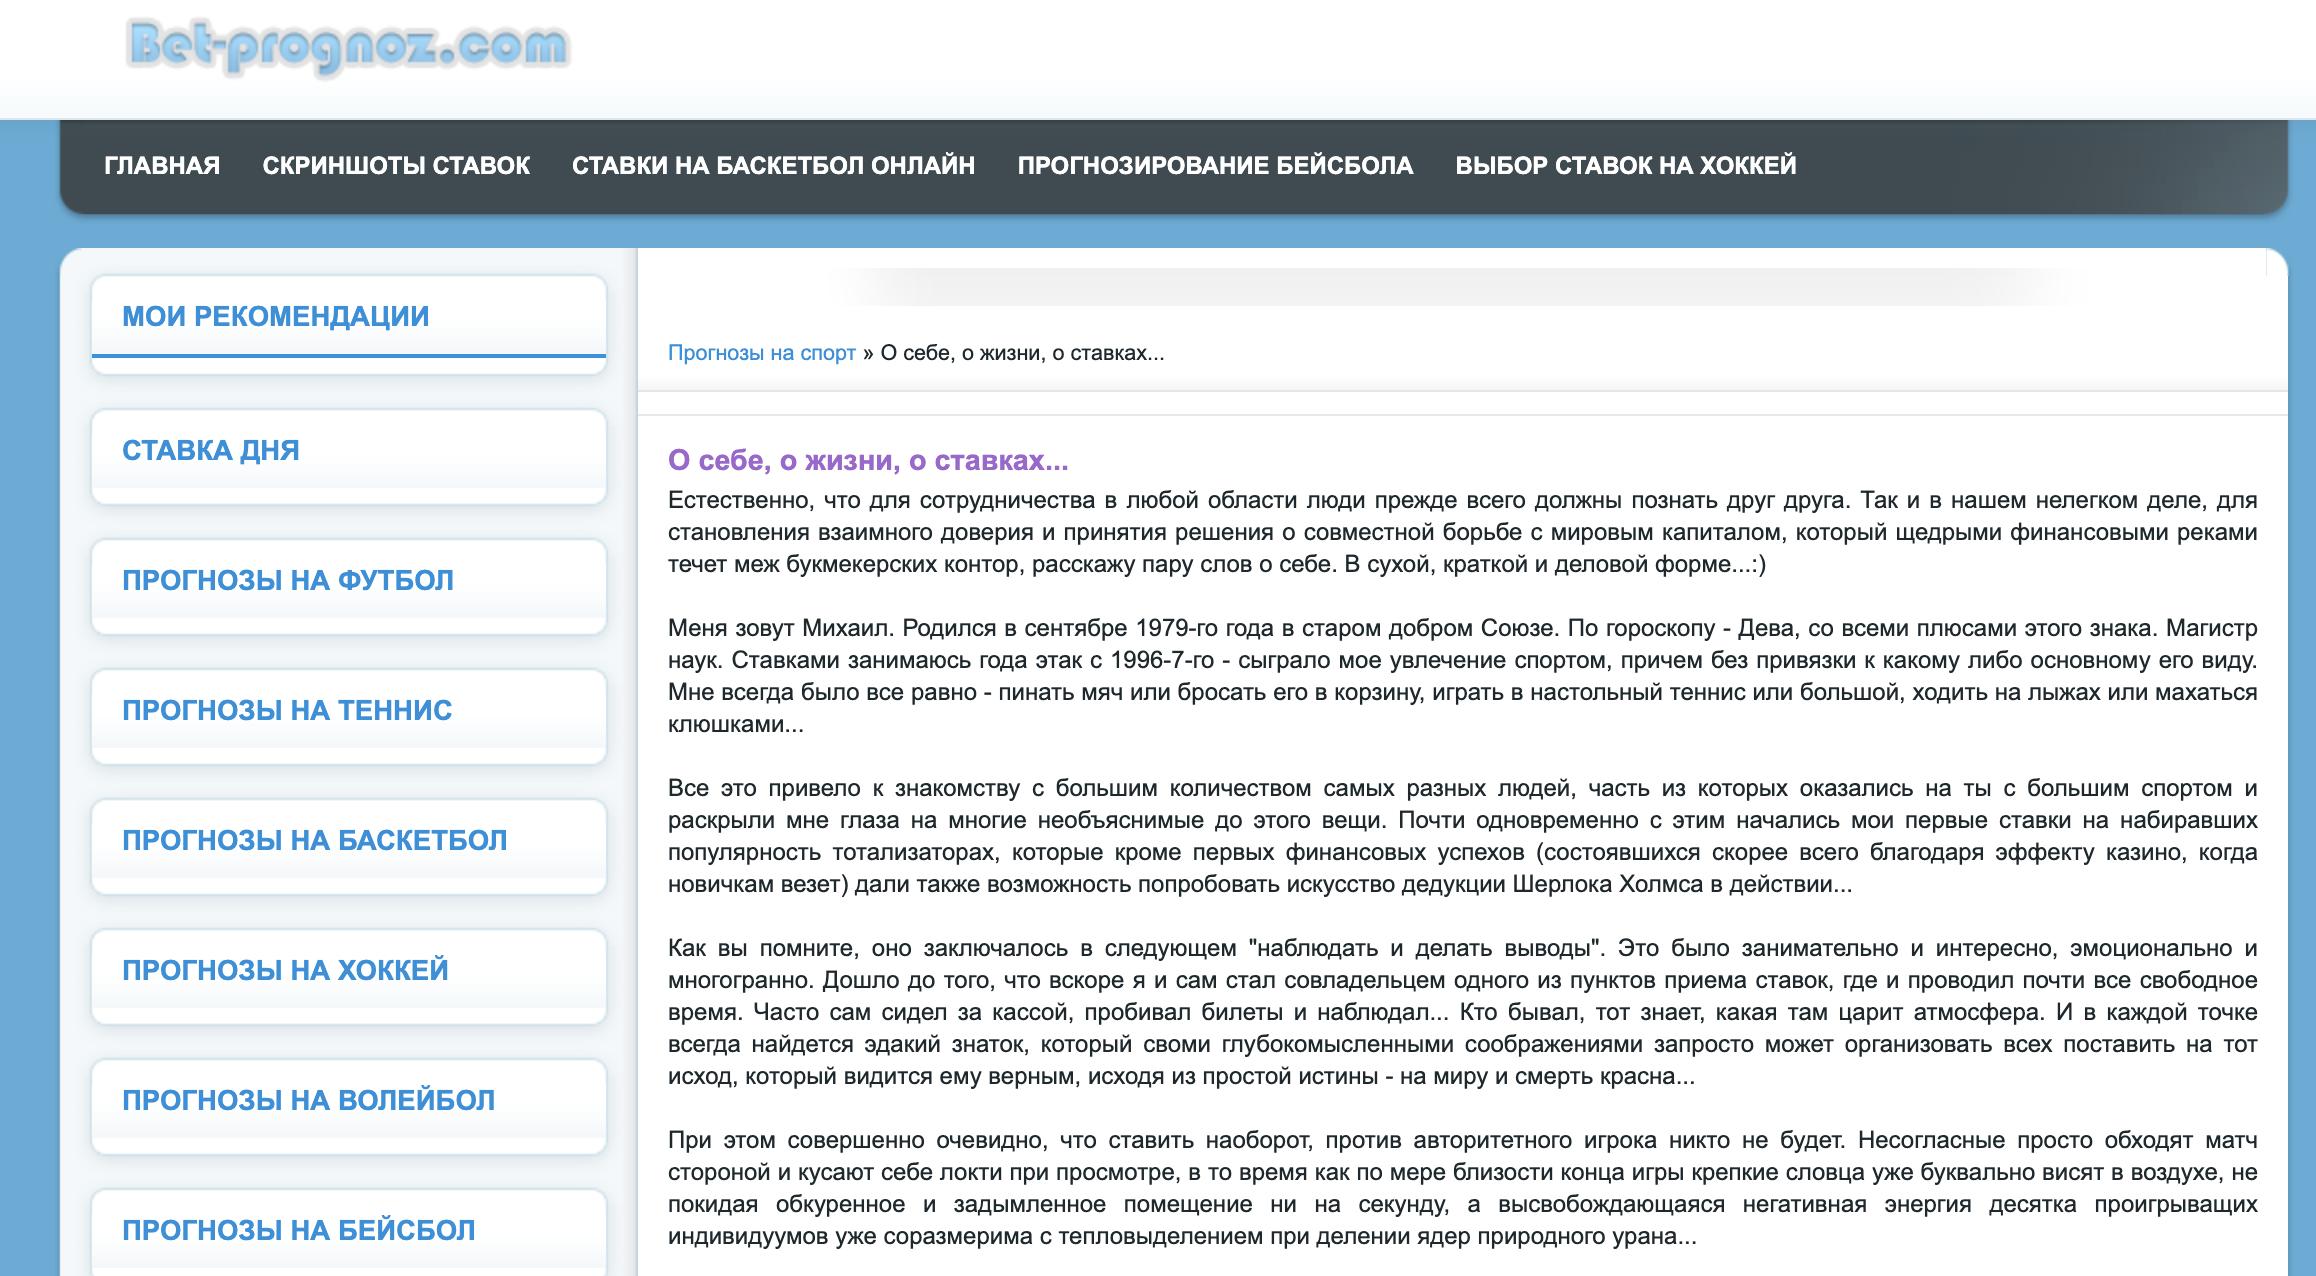 Информация о проекте Bet-рrognoz